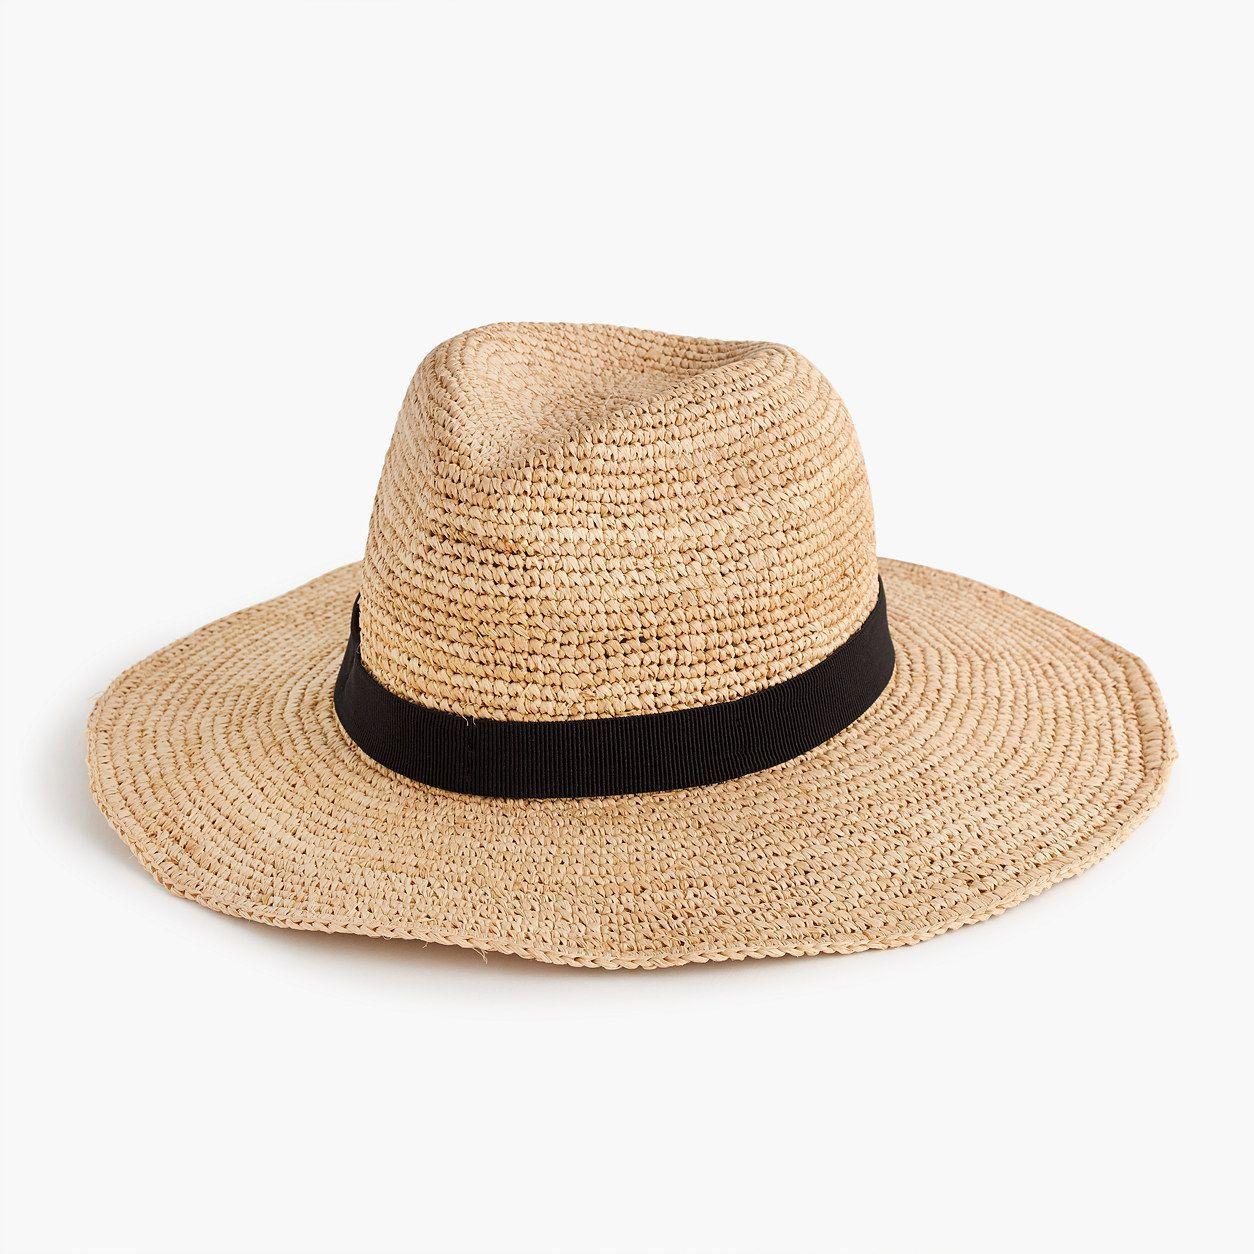 da28f91d58476 J.Crew Womens Wide-Brim Packable Straw Hat (Size M-L)